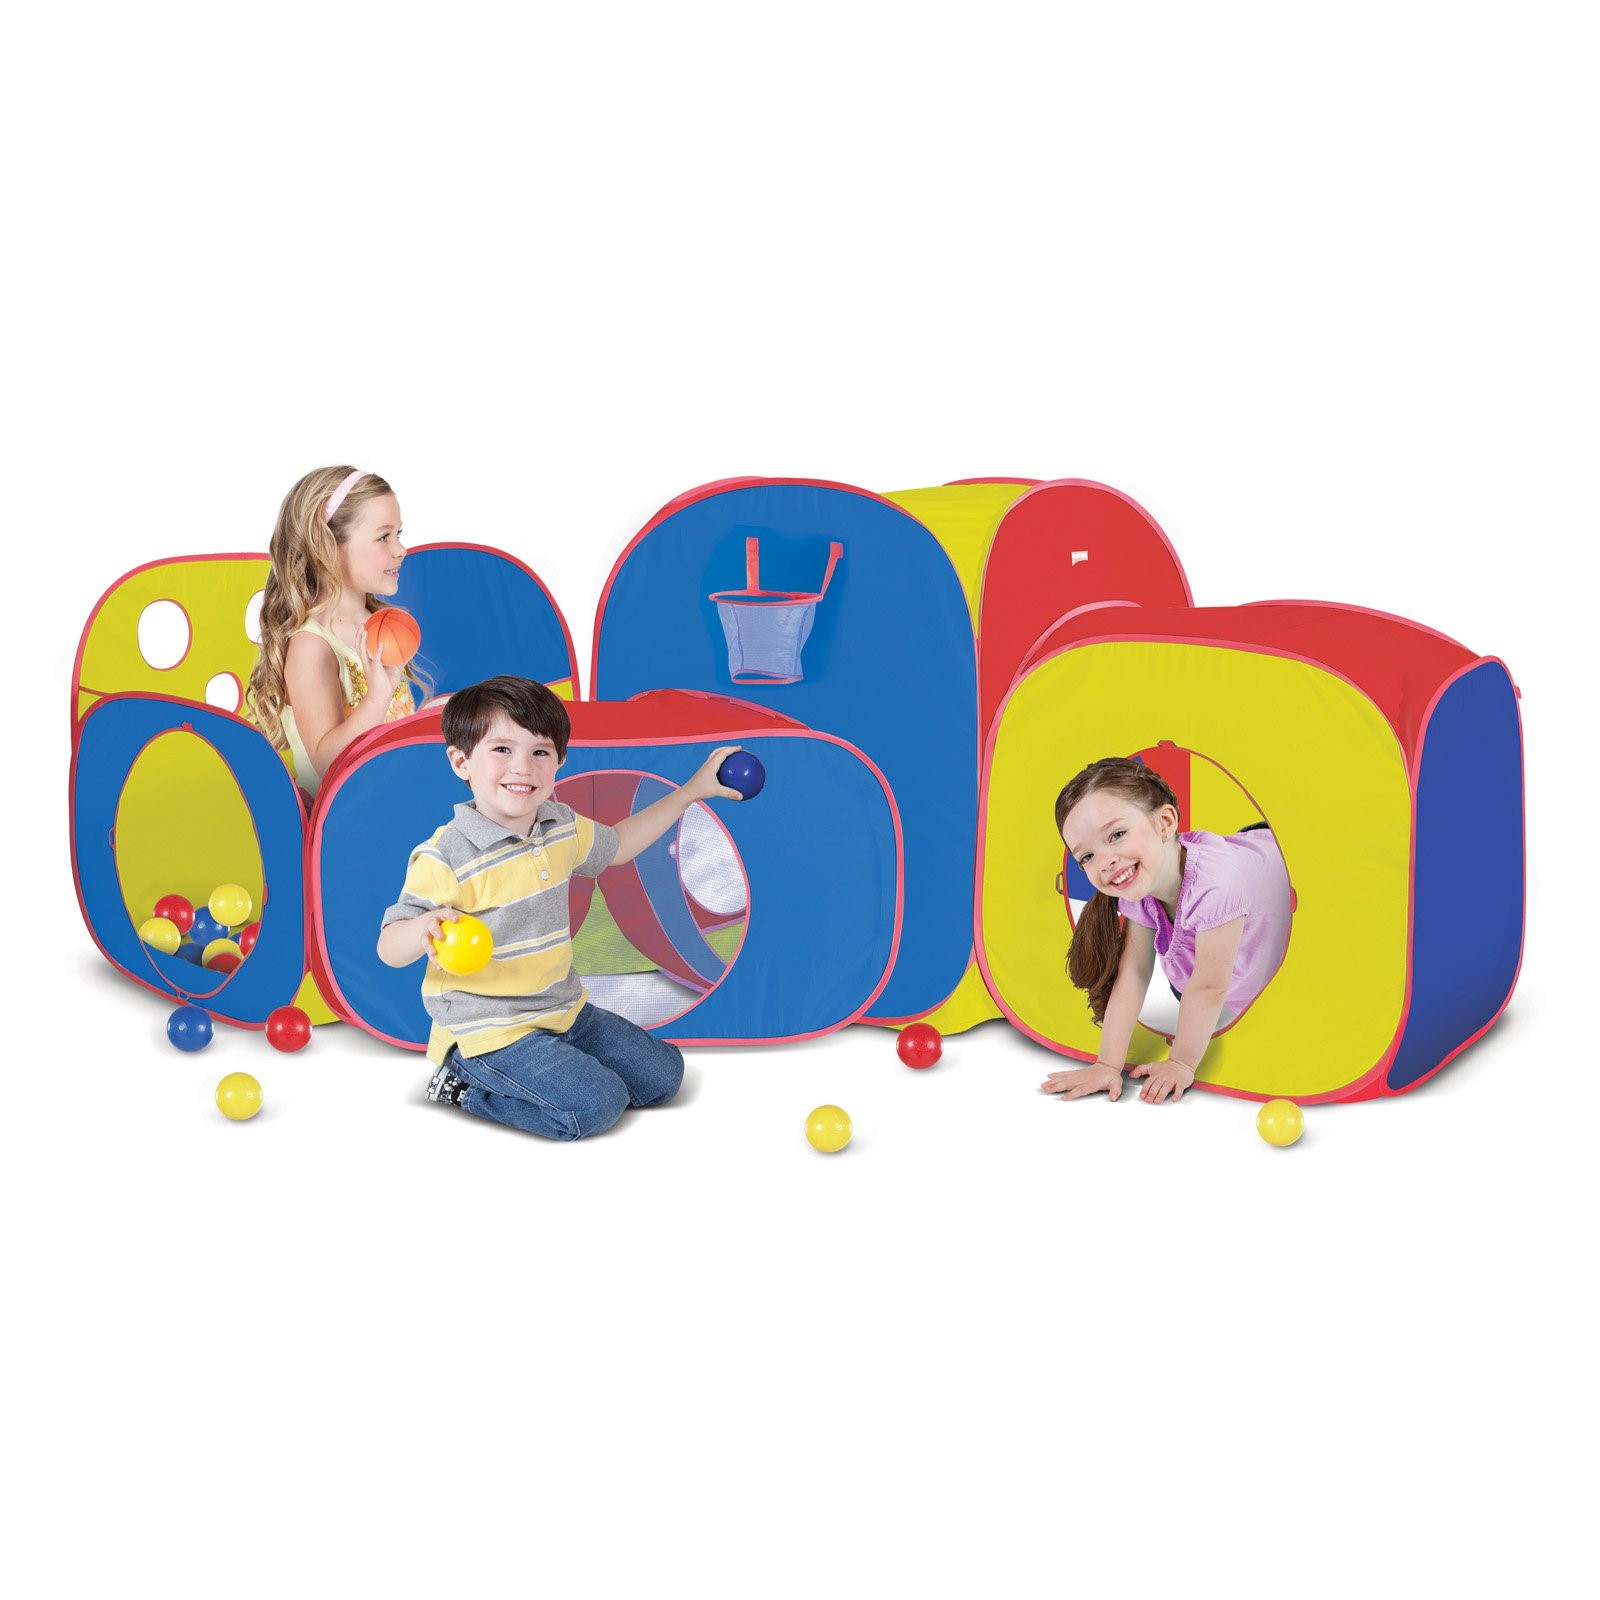 Playhut Mega Fun Play Tent